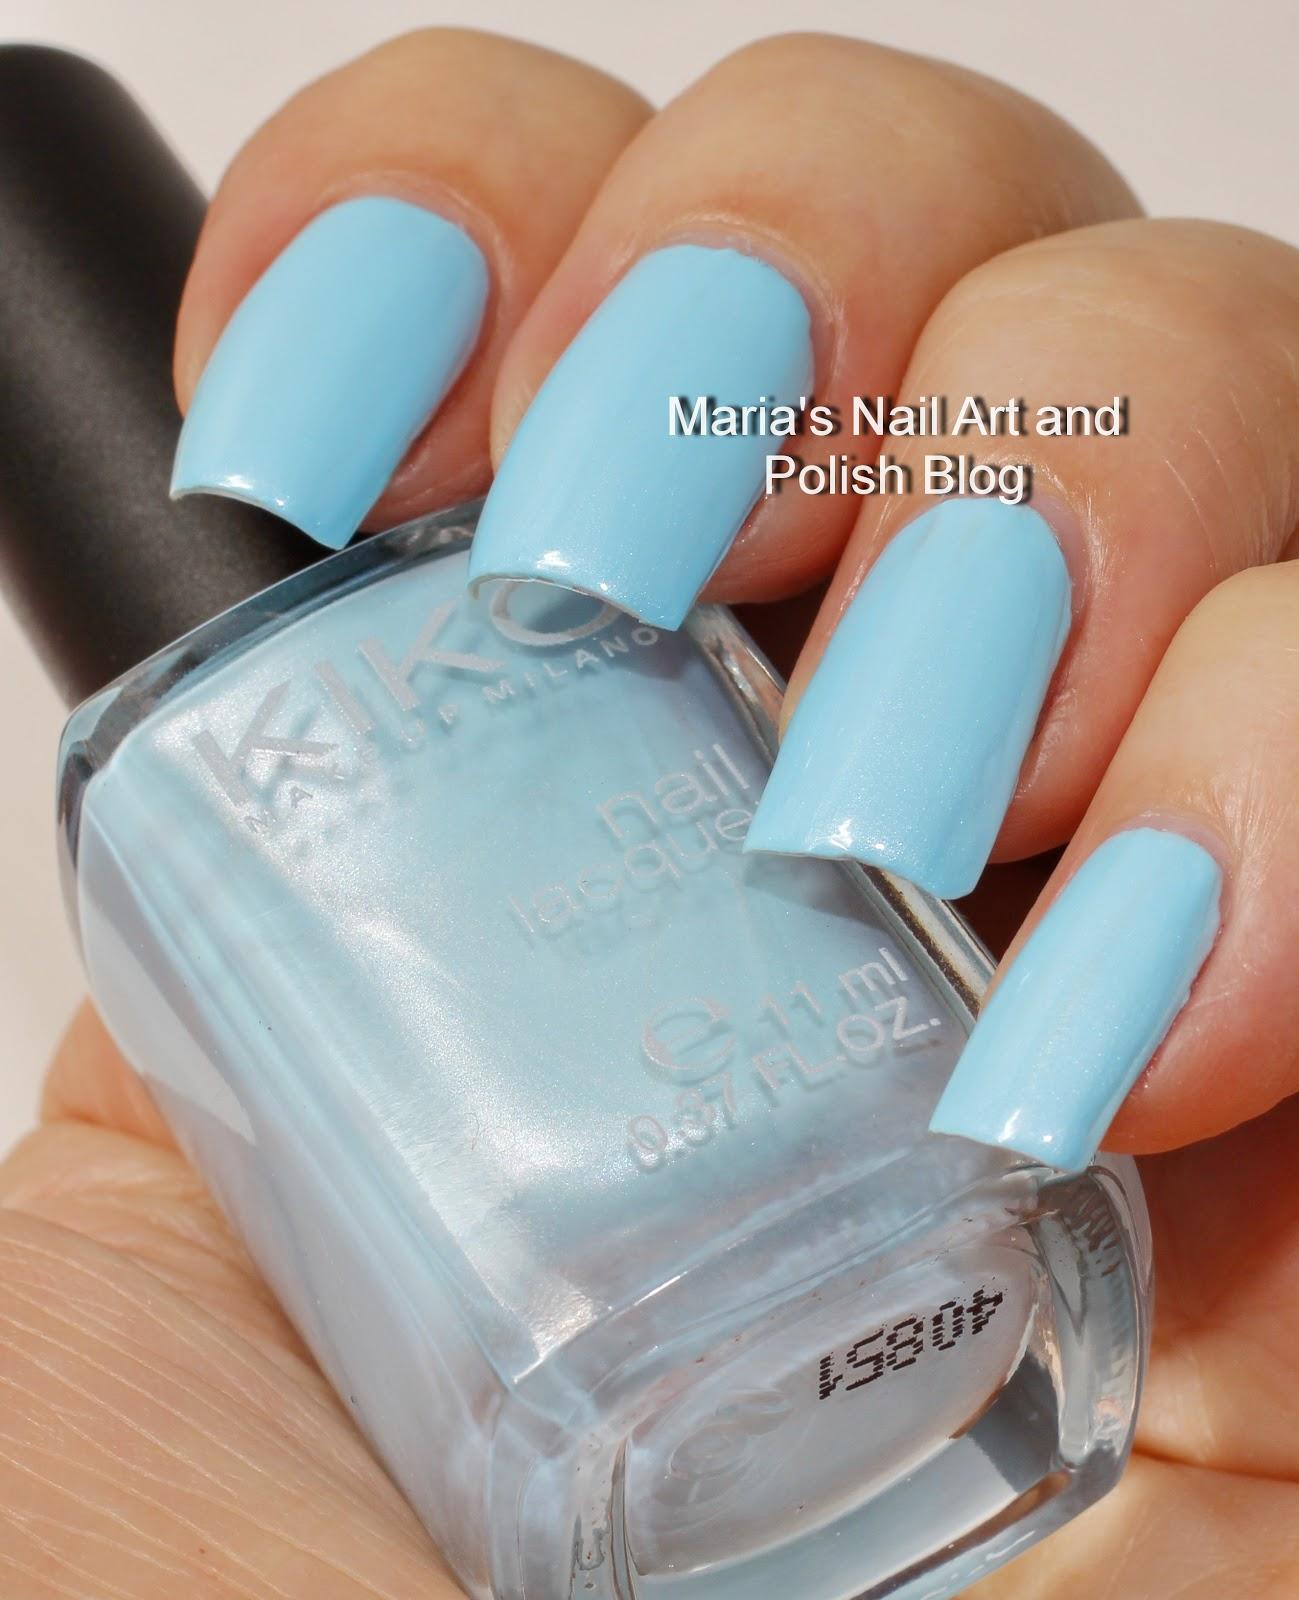 Marias Nail Art and Polish Blog: Kiko 525 Metallic Pastel Blue 277 ...